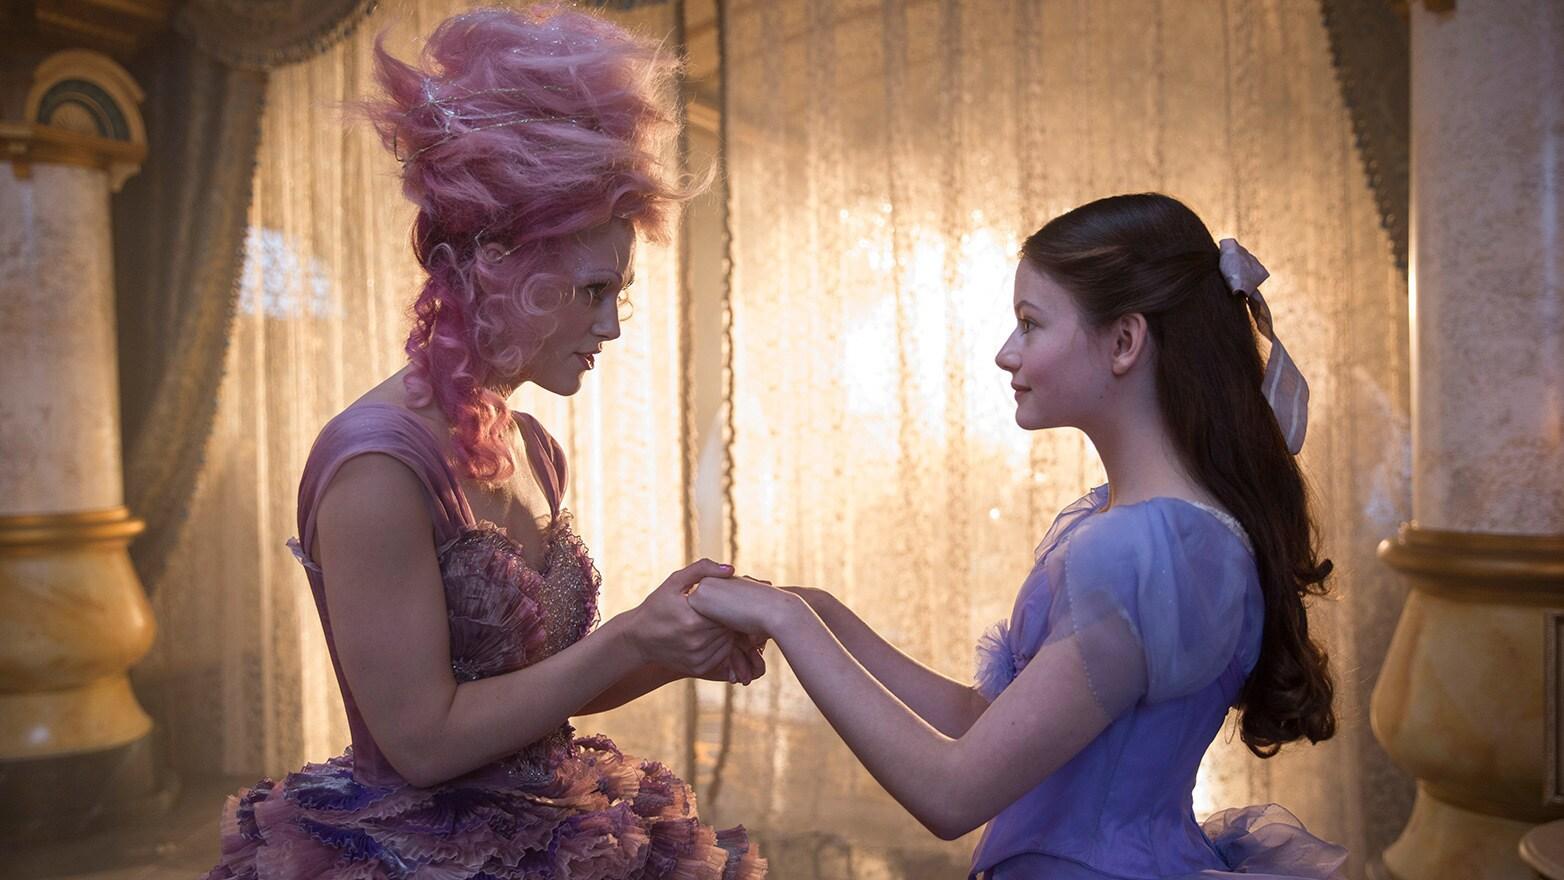 Keira Knightley as the Sugar Plum Fairy and Mackenzie Foy as Clara.